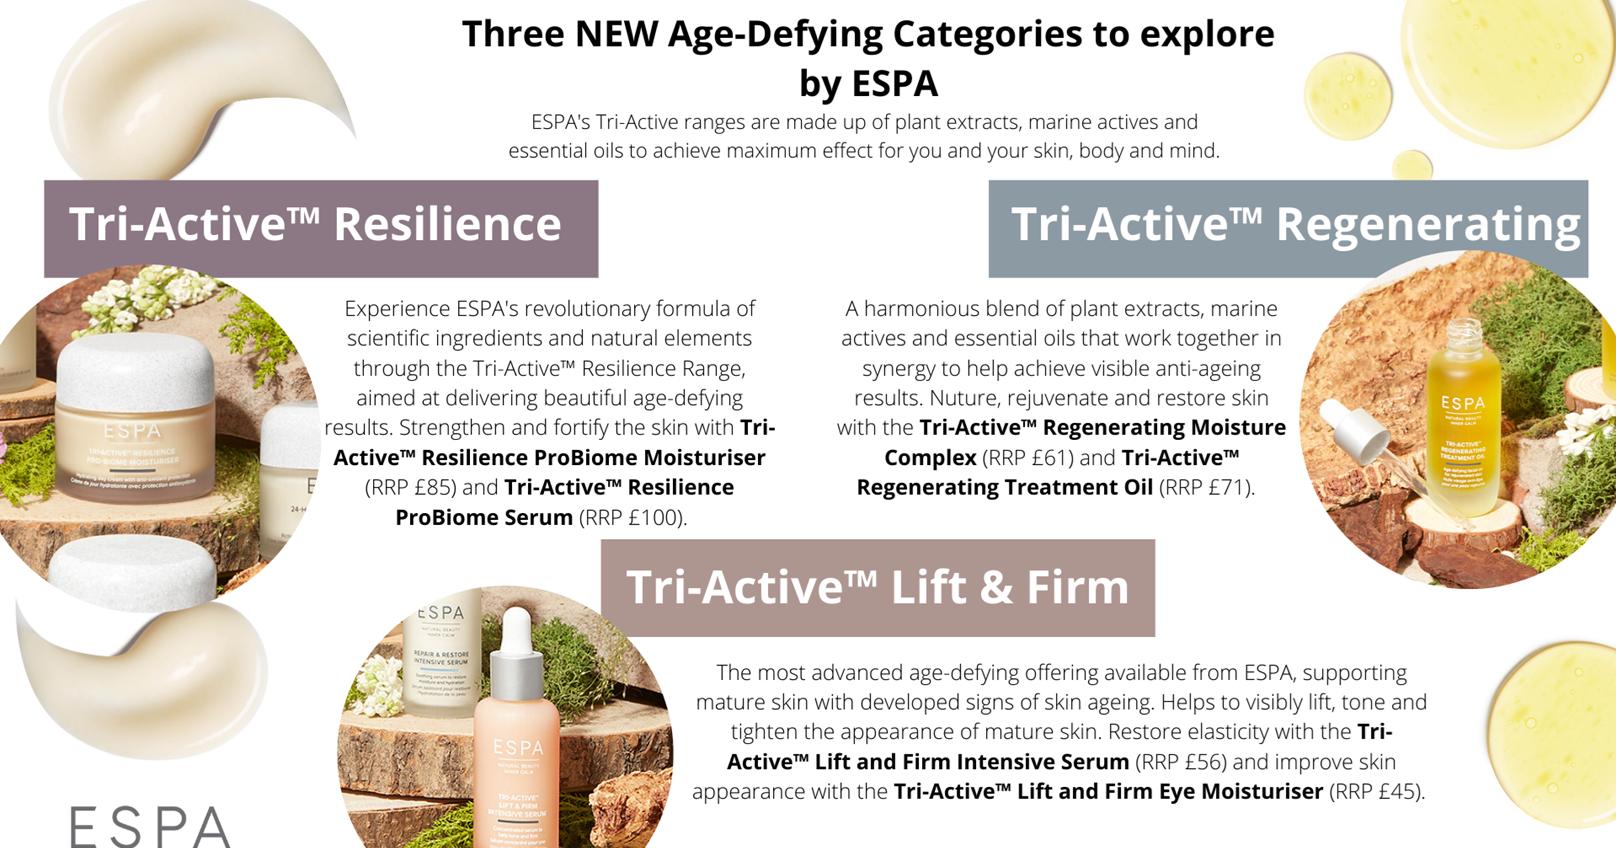 ESPA tri-Active Rejuvenating Treatment Oil